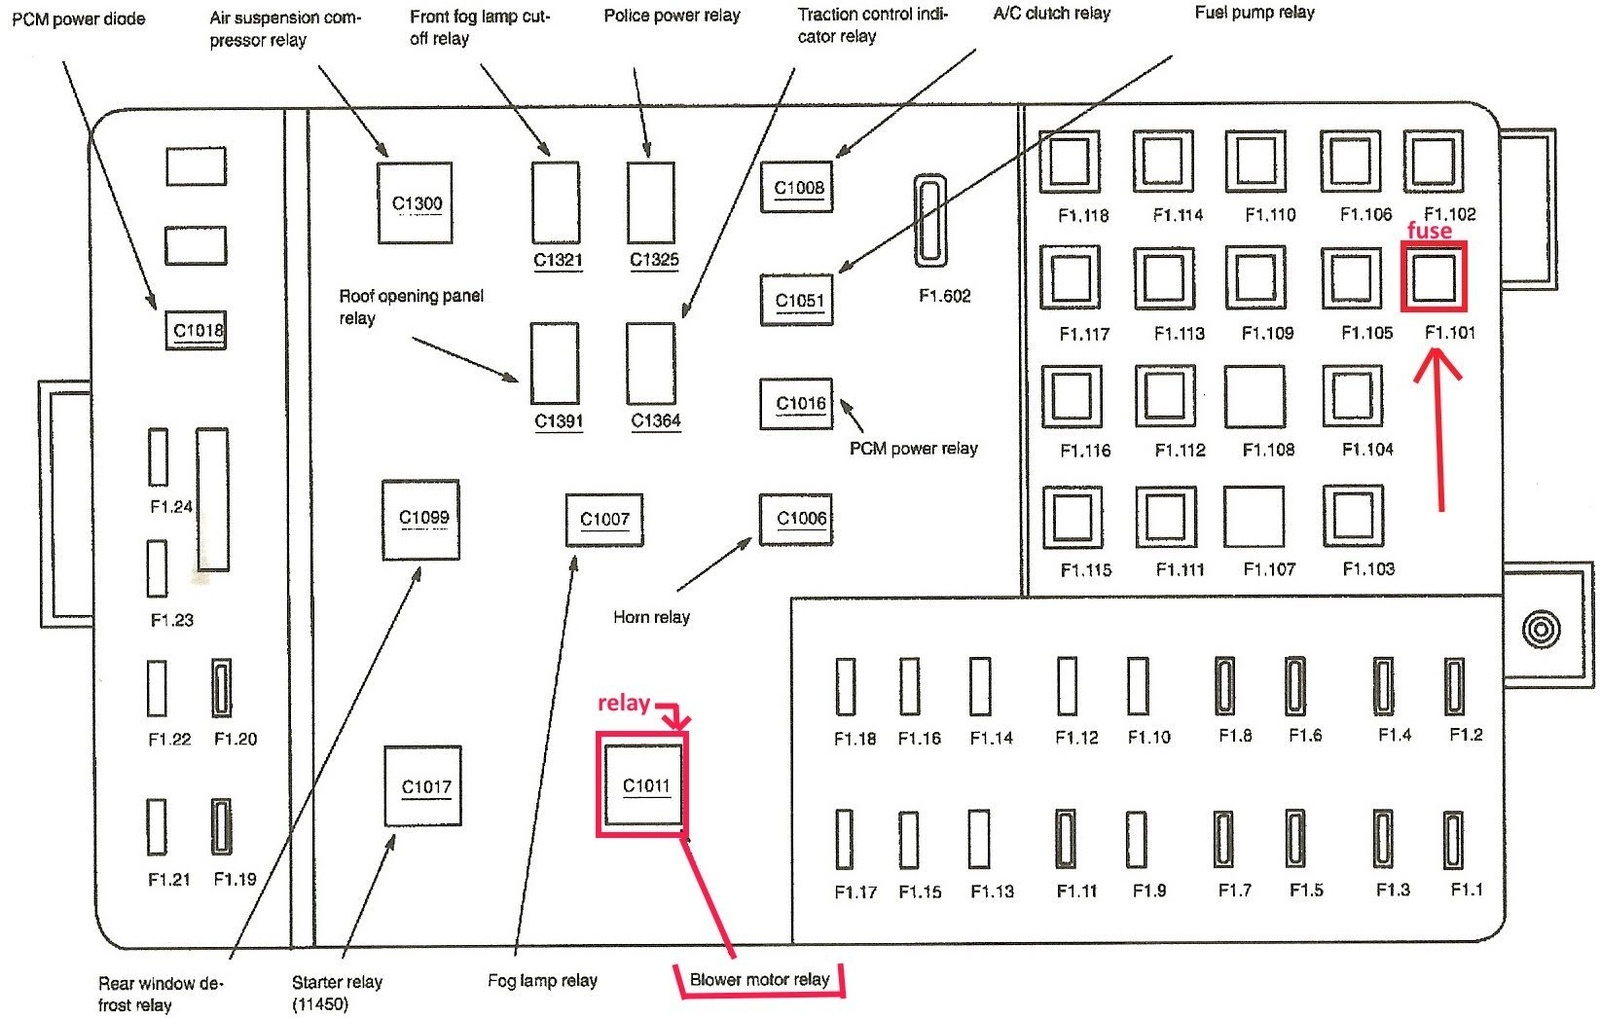 pic 4554908895057446462 1600x1200?resize=665%2C423 1999 isuzu npr wiring diagram wiring diagram 2016 isuzu npr trailer wiring diagram at fashall.co